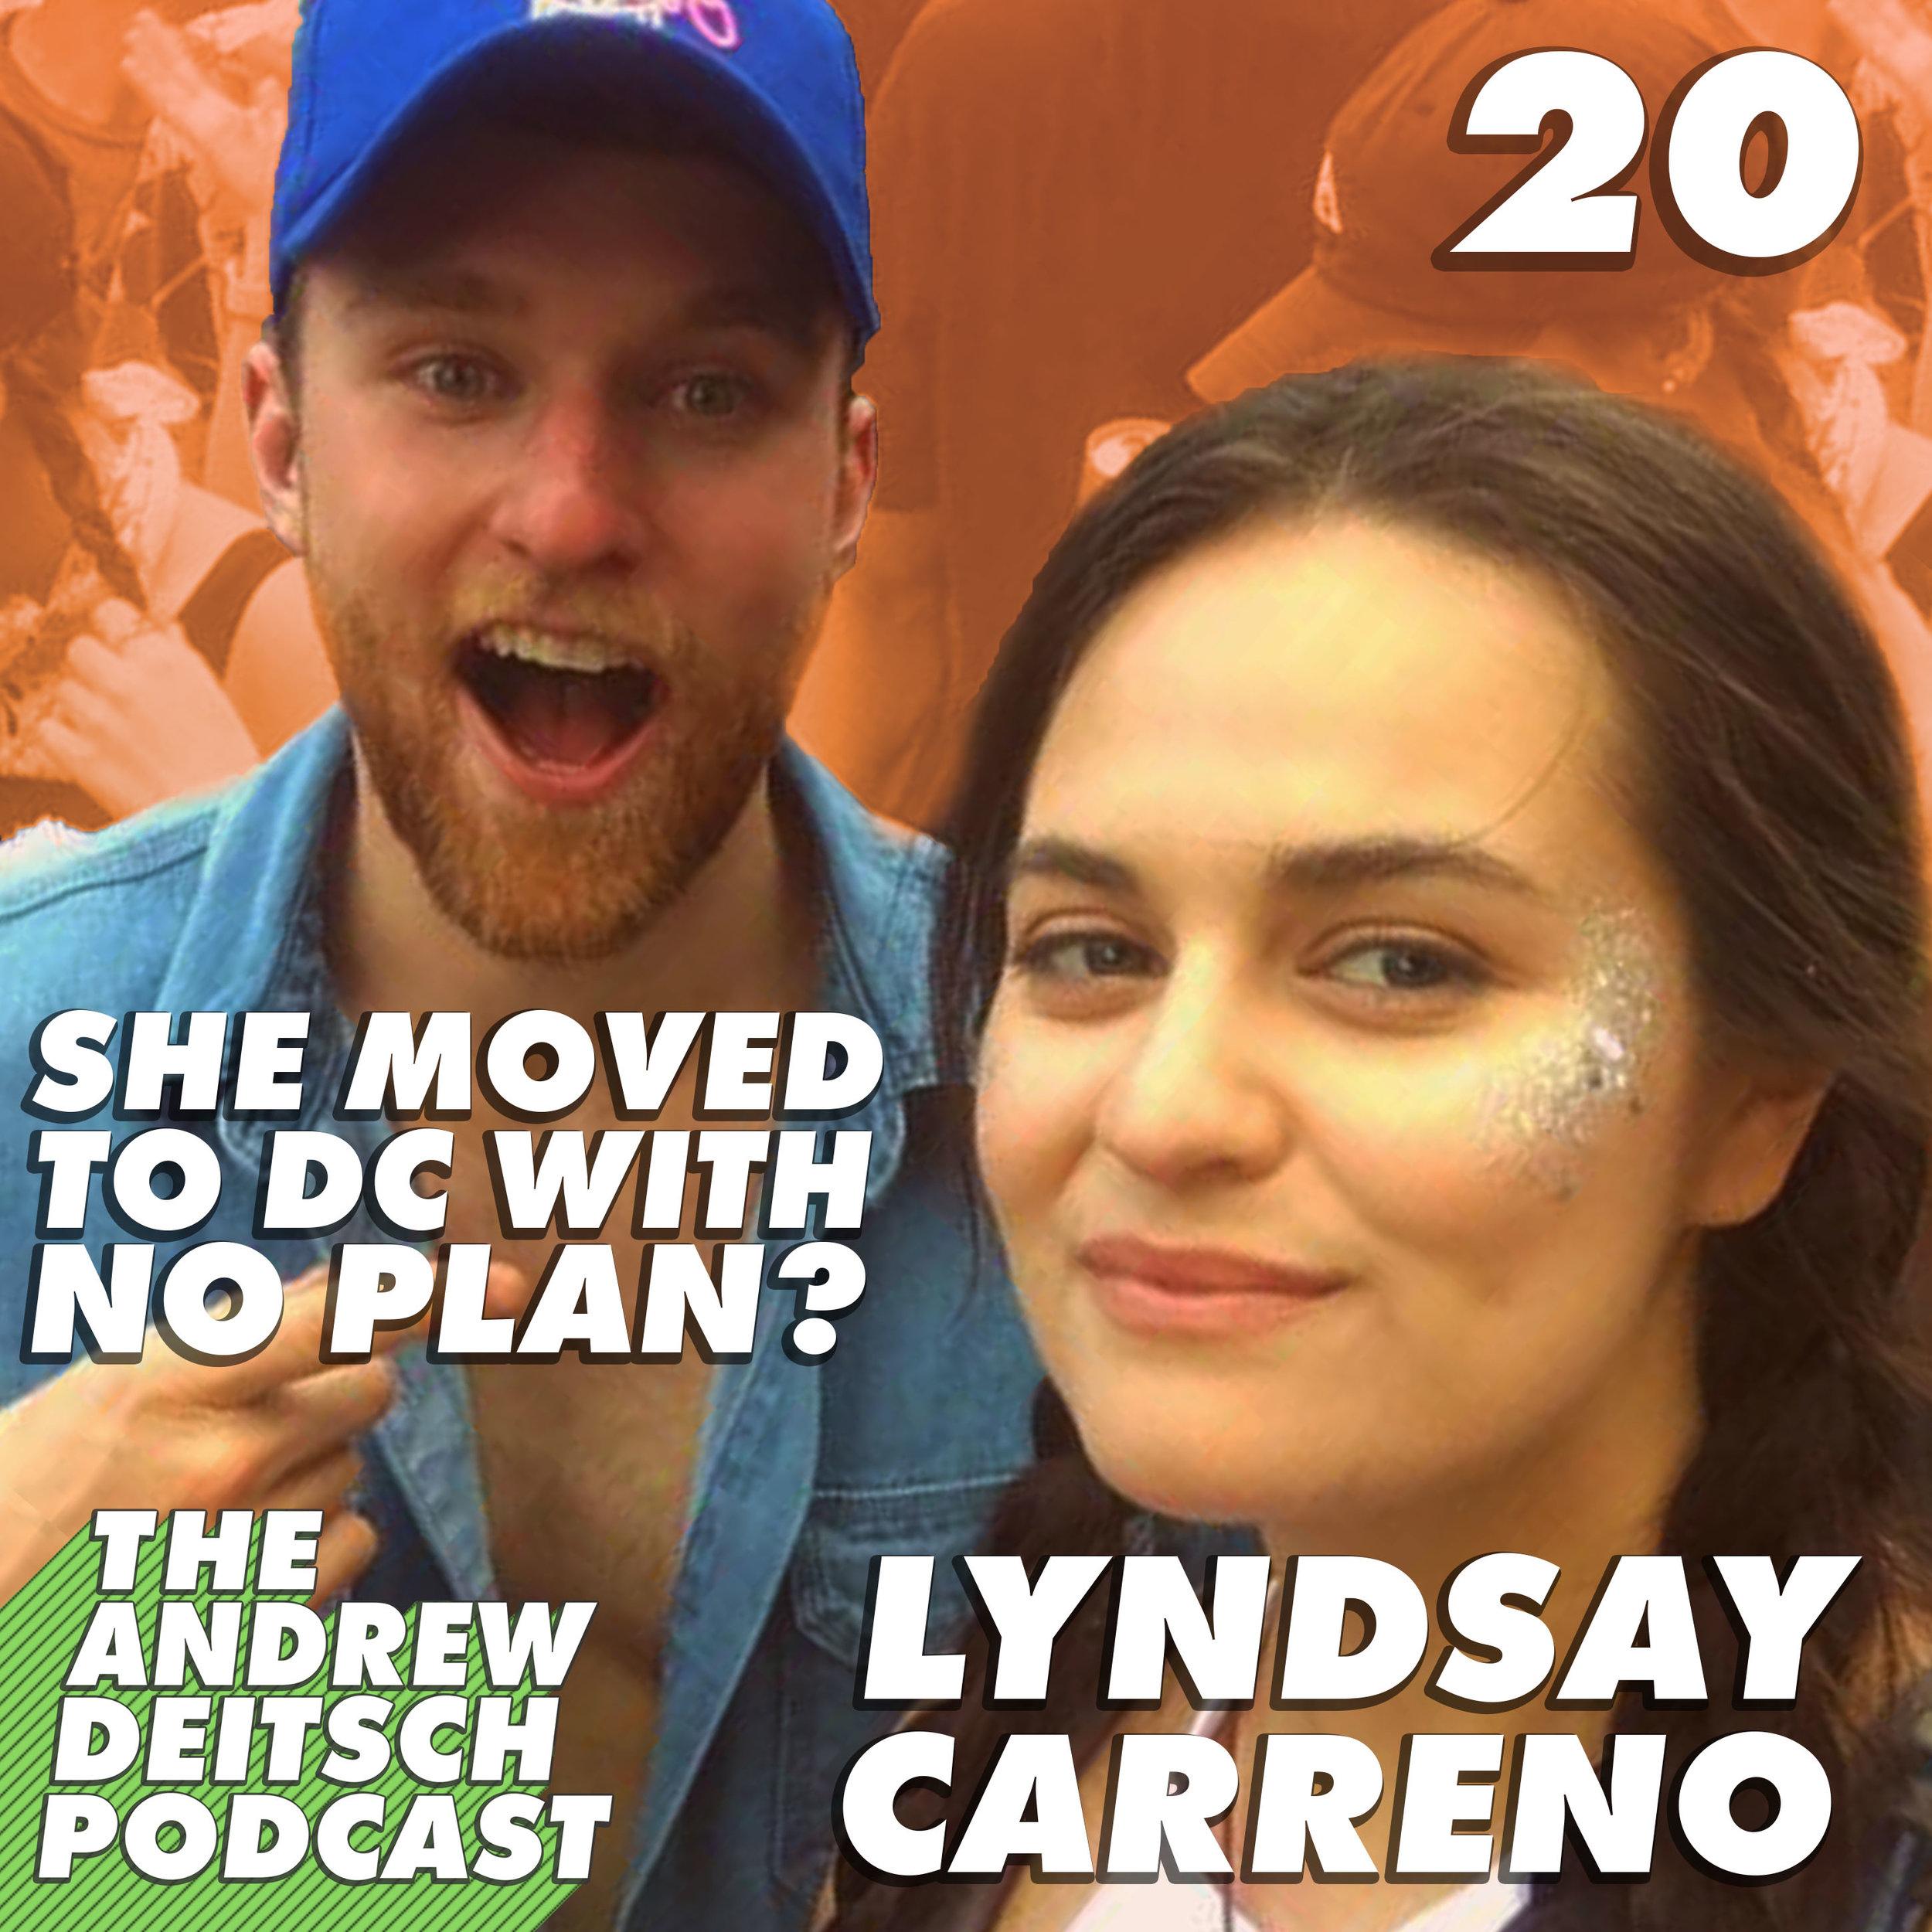 20-lyndsay-carreno